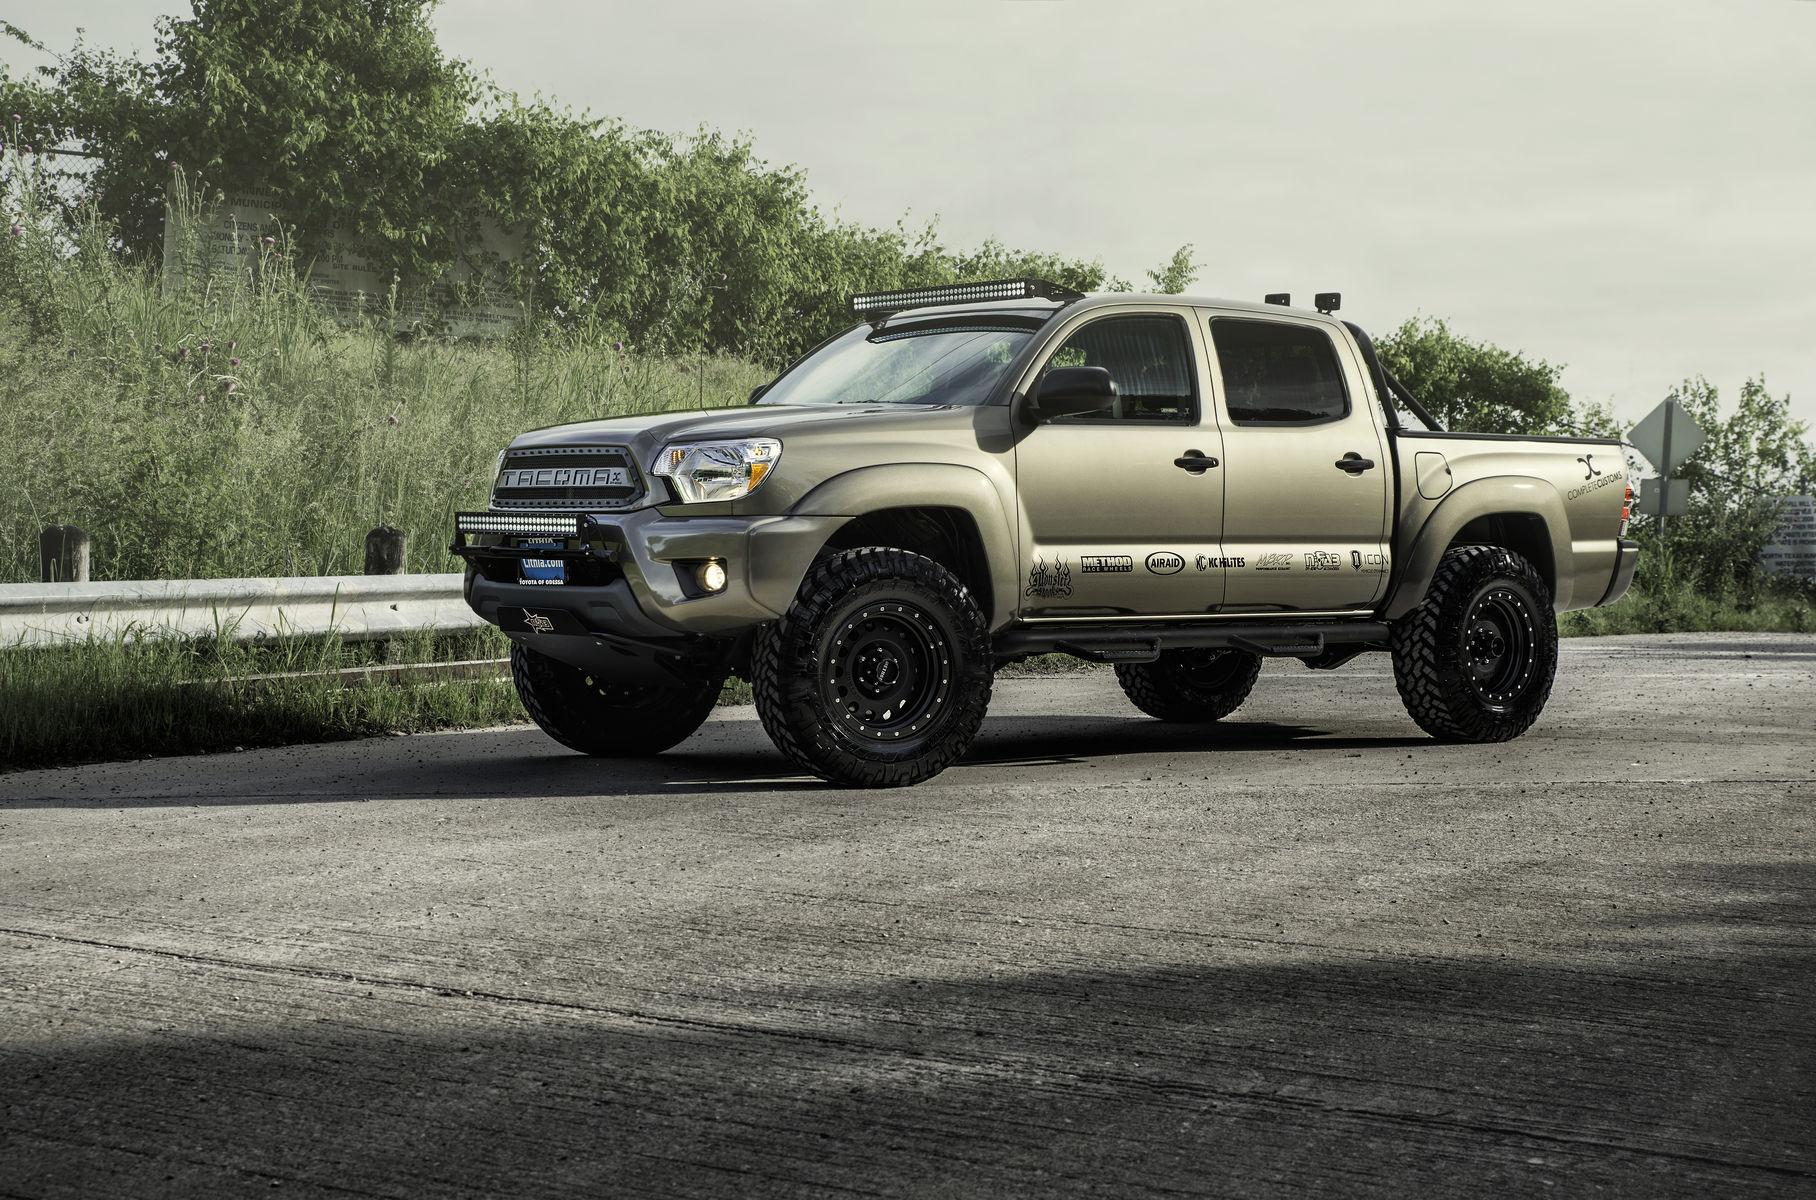 Toyota Tundra | Complete Customs Toyota Tacoma Build